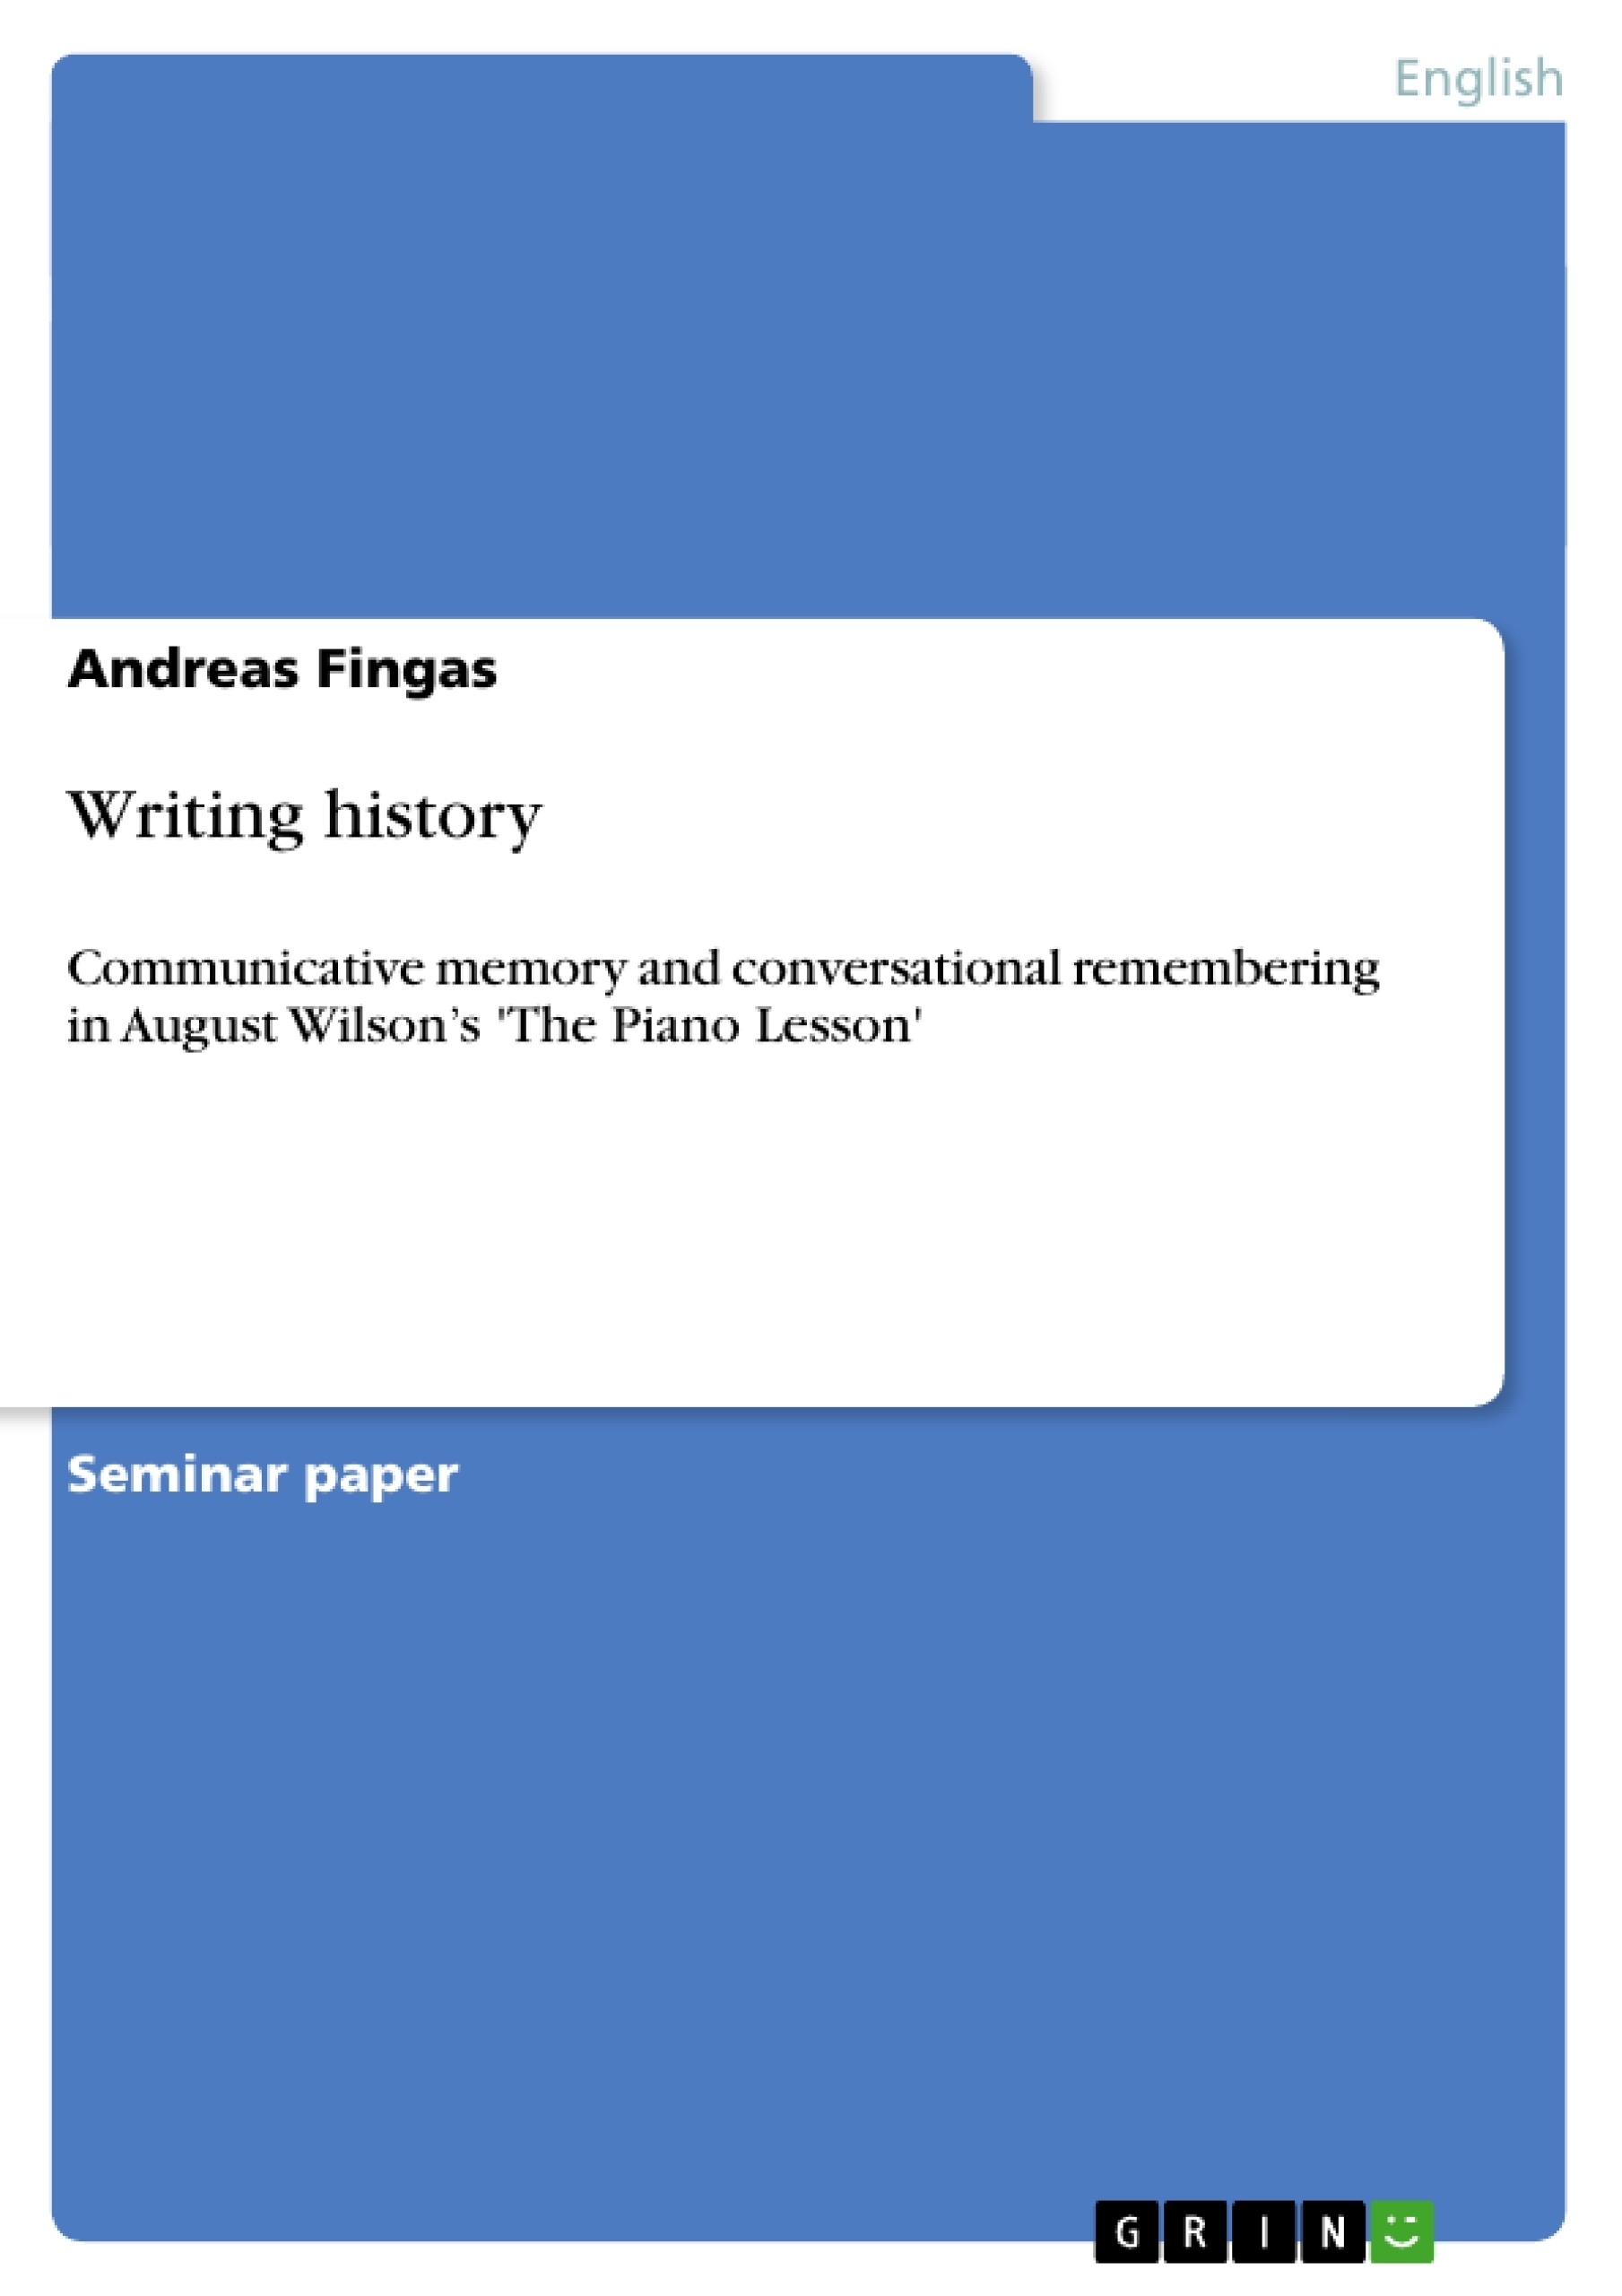 Title: Writing history